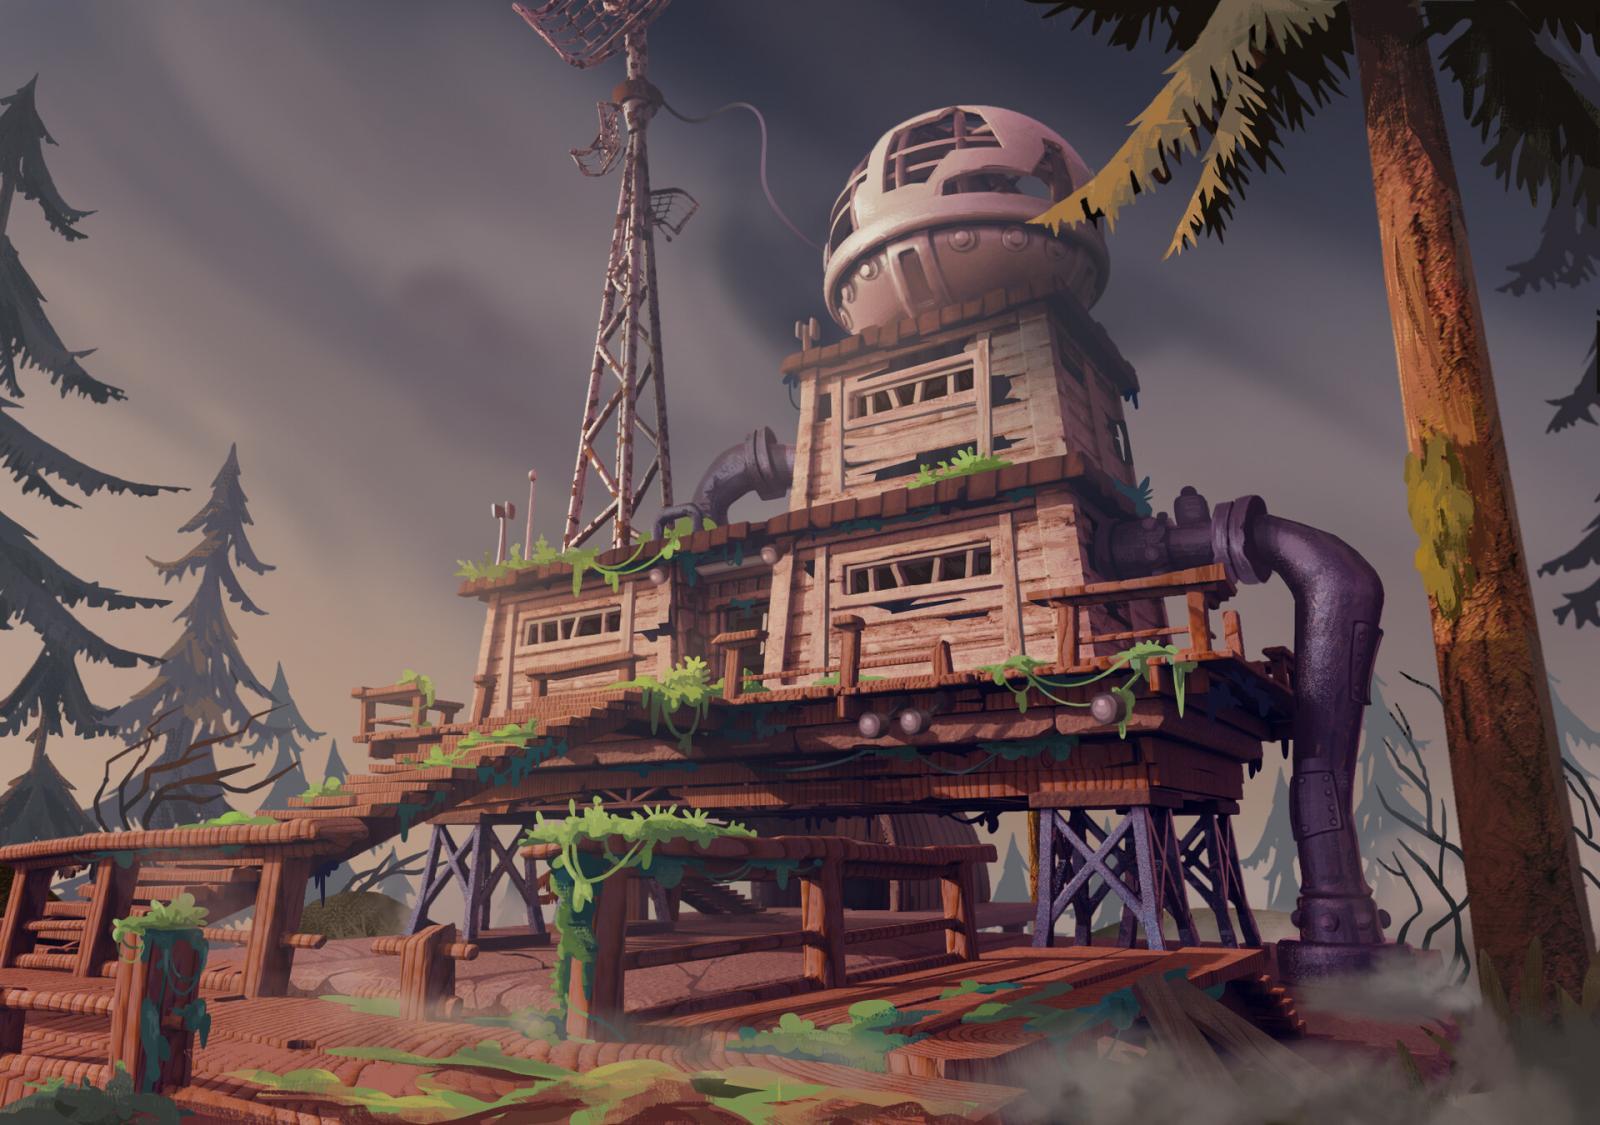 ruslan-laptenko-abandoned-camp-2.jpg